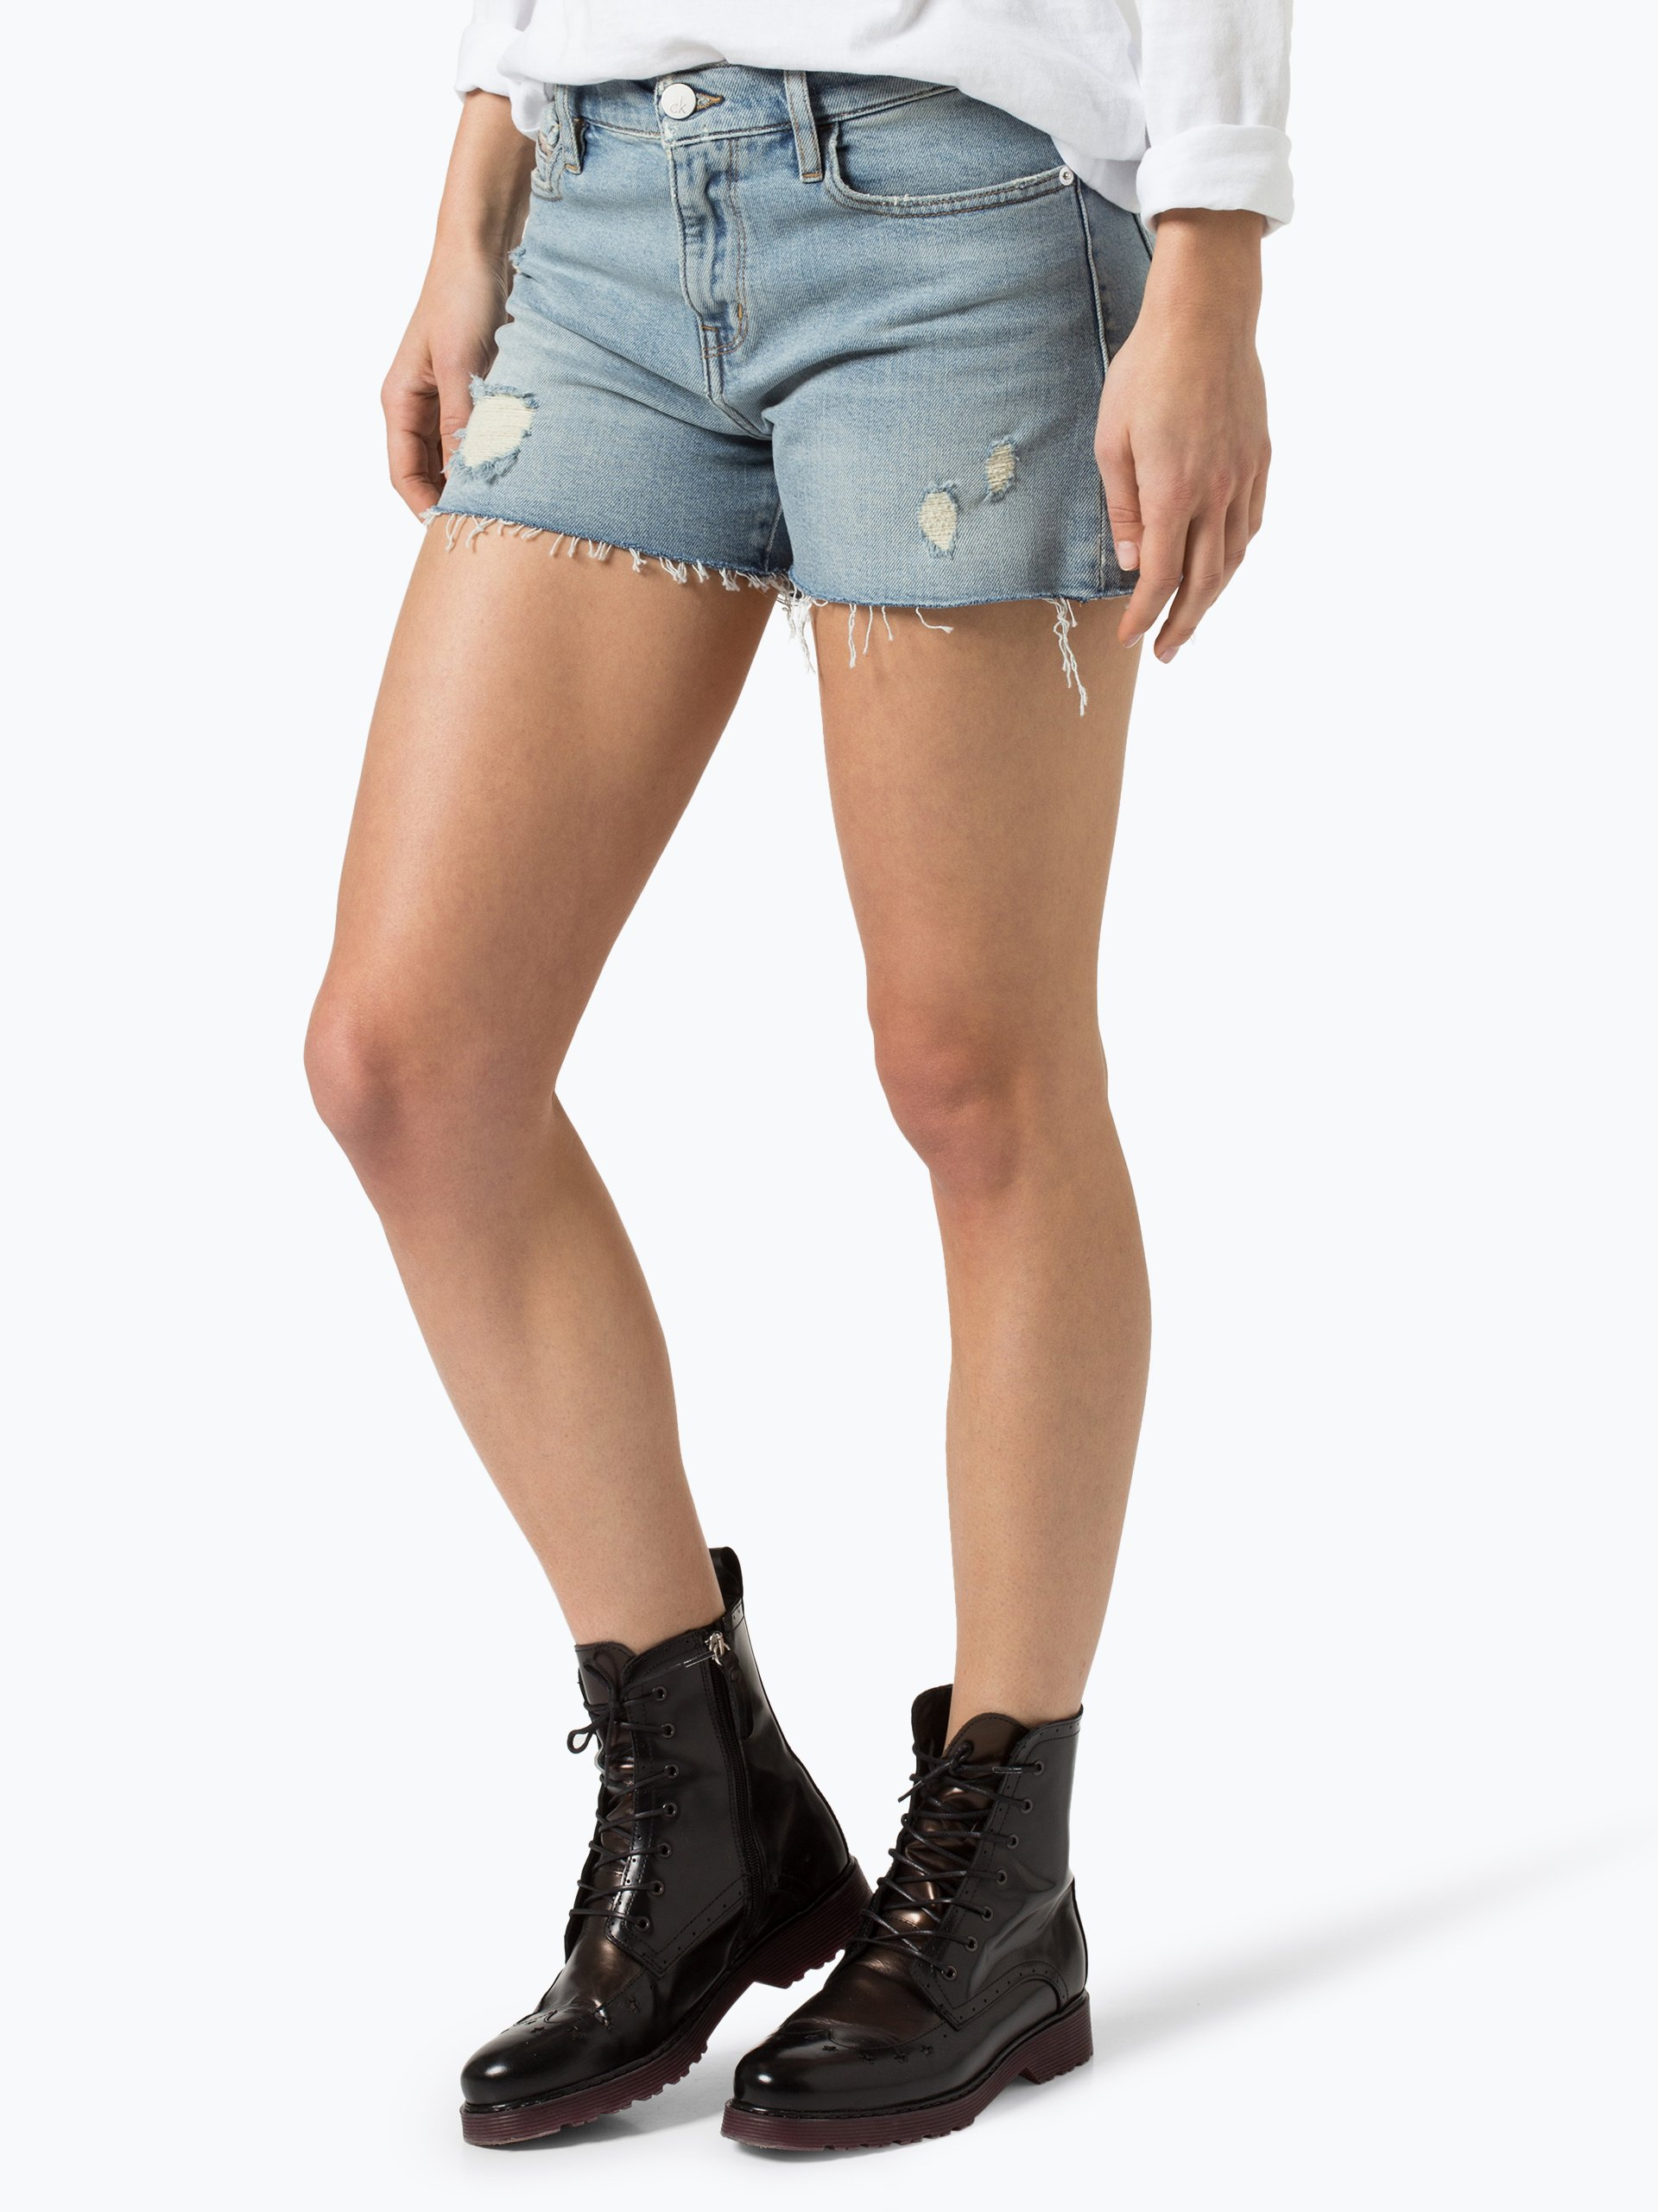 calvin klein jeans damen jeansshorts hellblau uni online. Black Bedroom Furniture Sets. Home Design Ideas